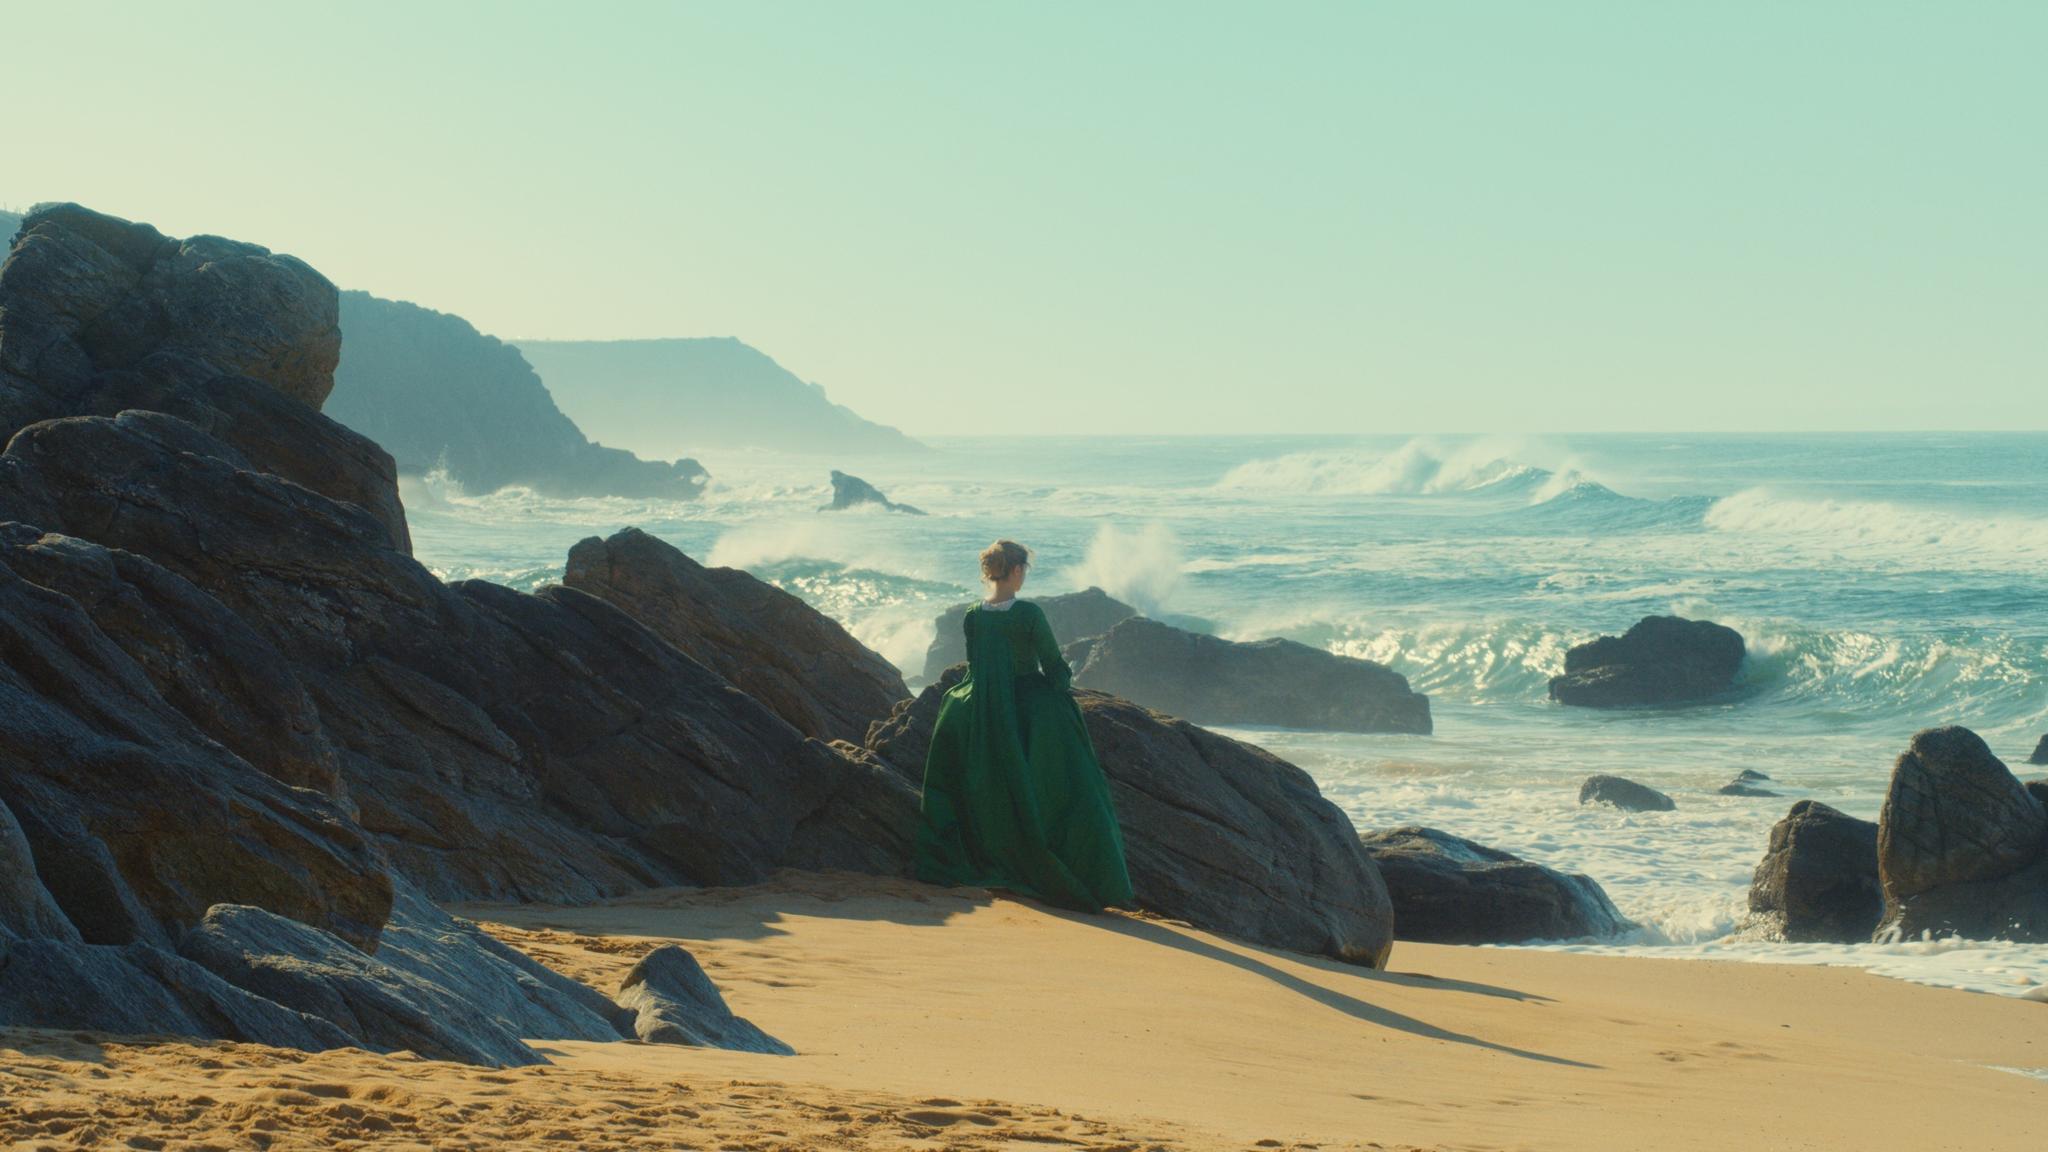 Slutspurt på filmfestivalen i Cannes